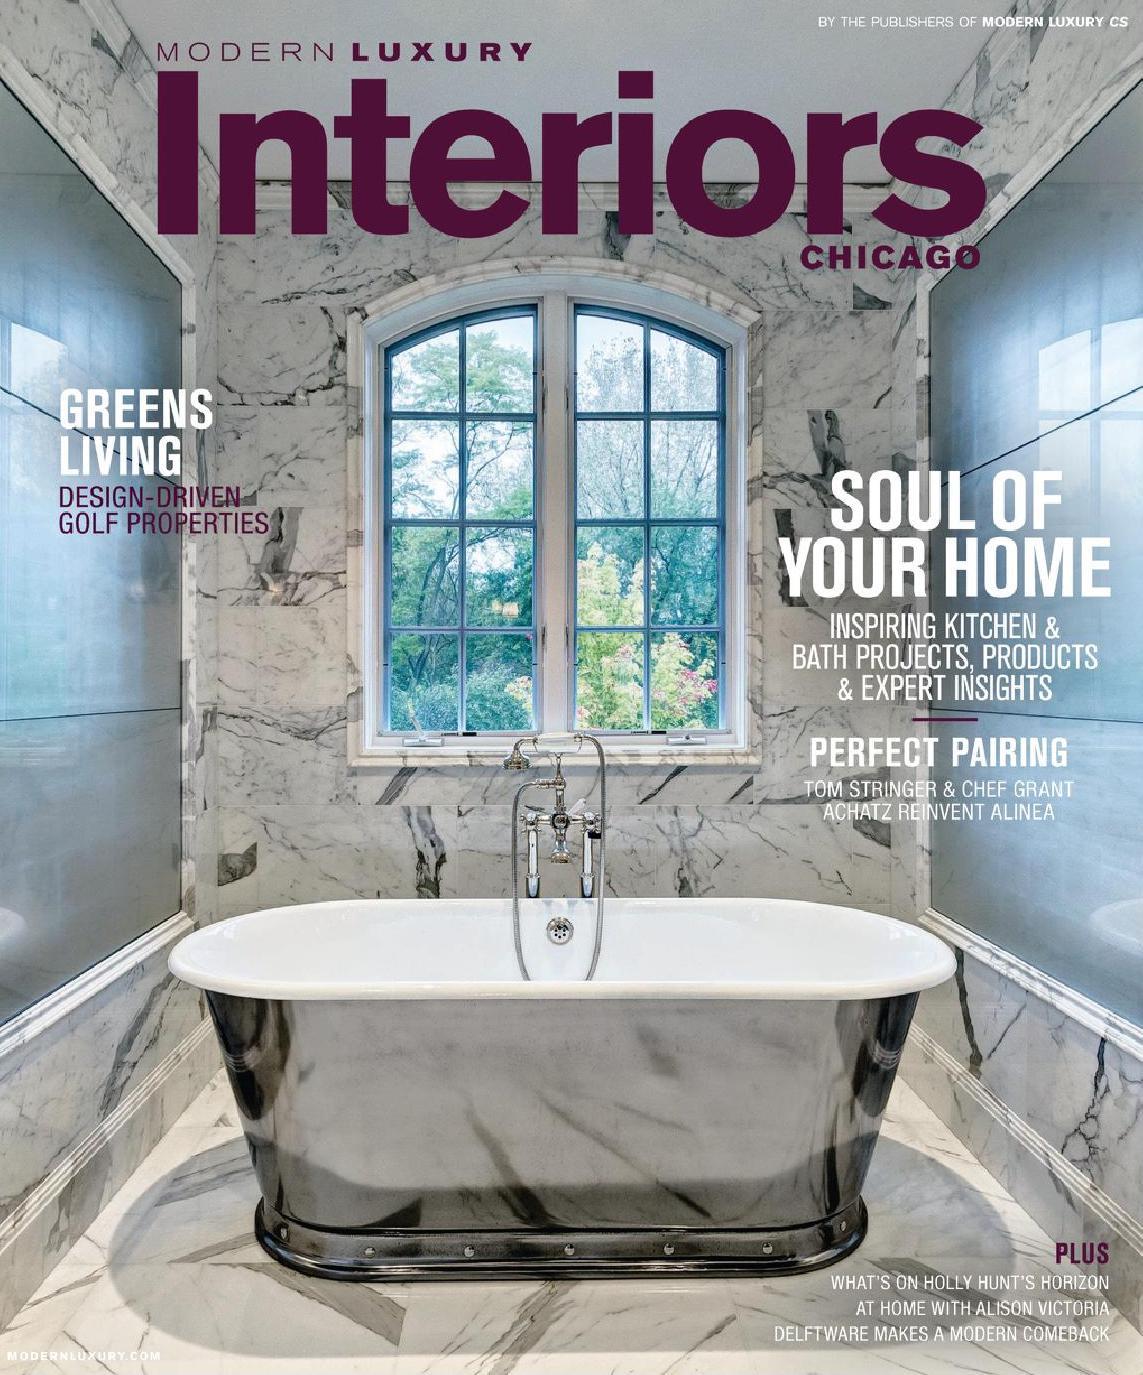 Modern Luxury Interiors Chicago - NMI Gallery 19